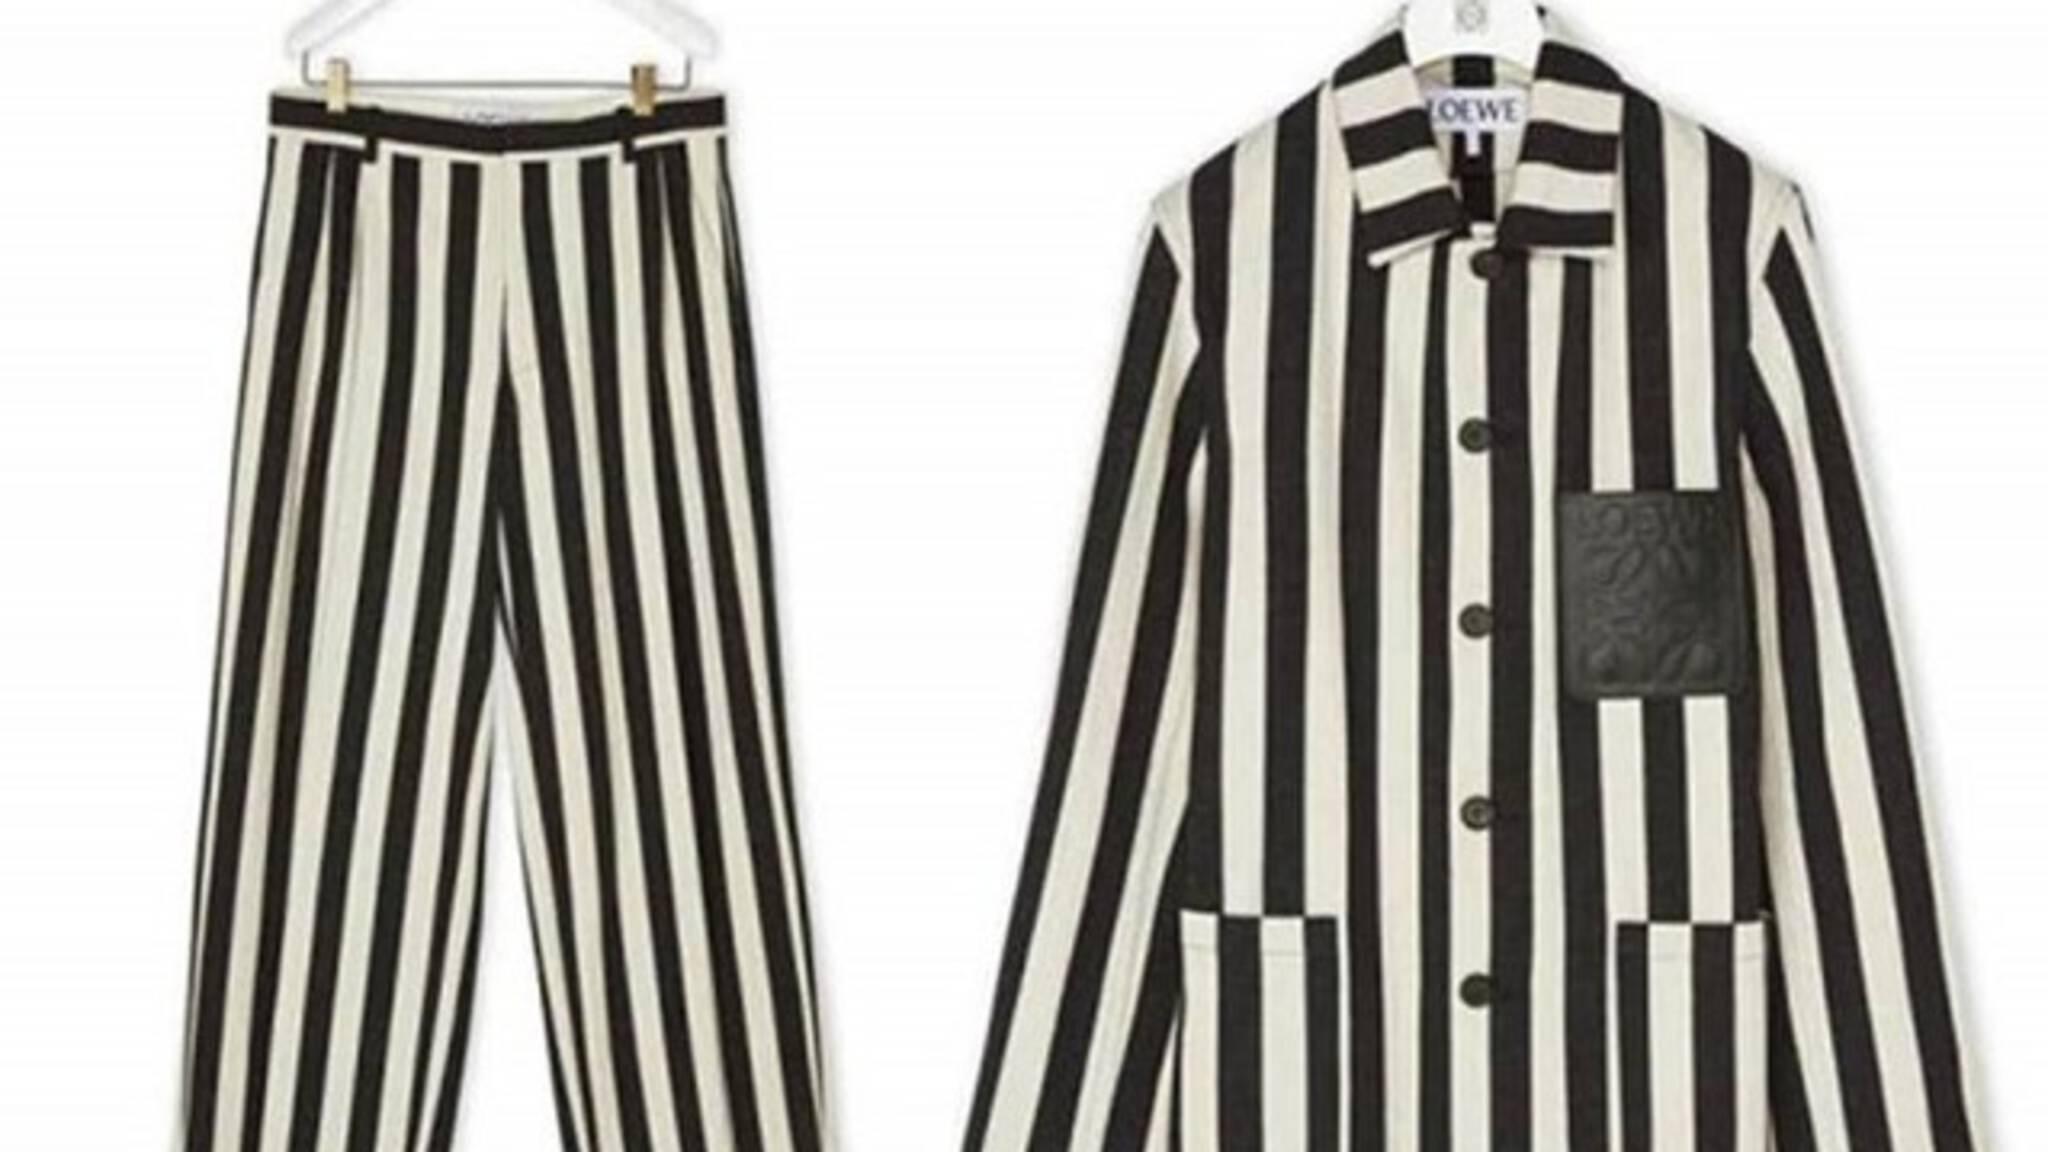 Ophef om 'concentratiekamp-pak' Spaans modehuis